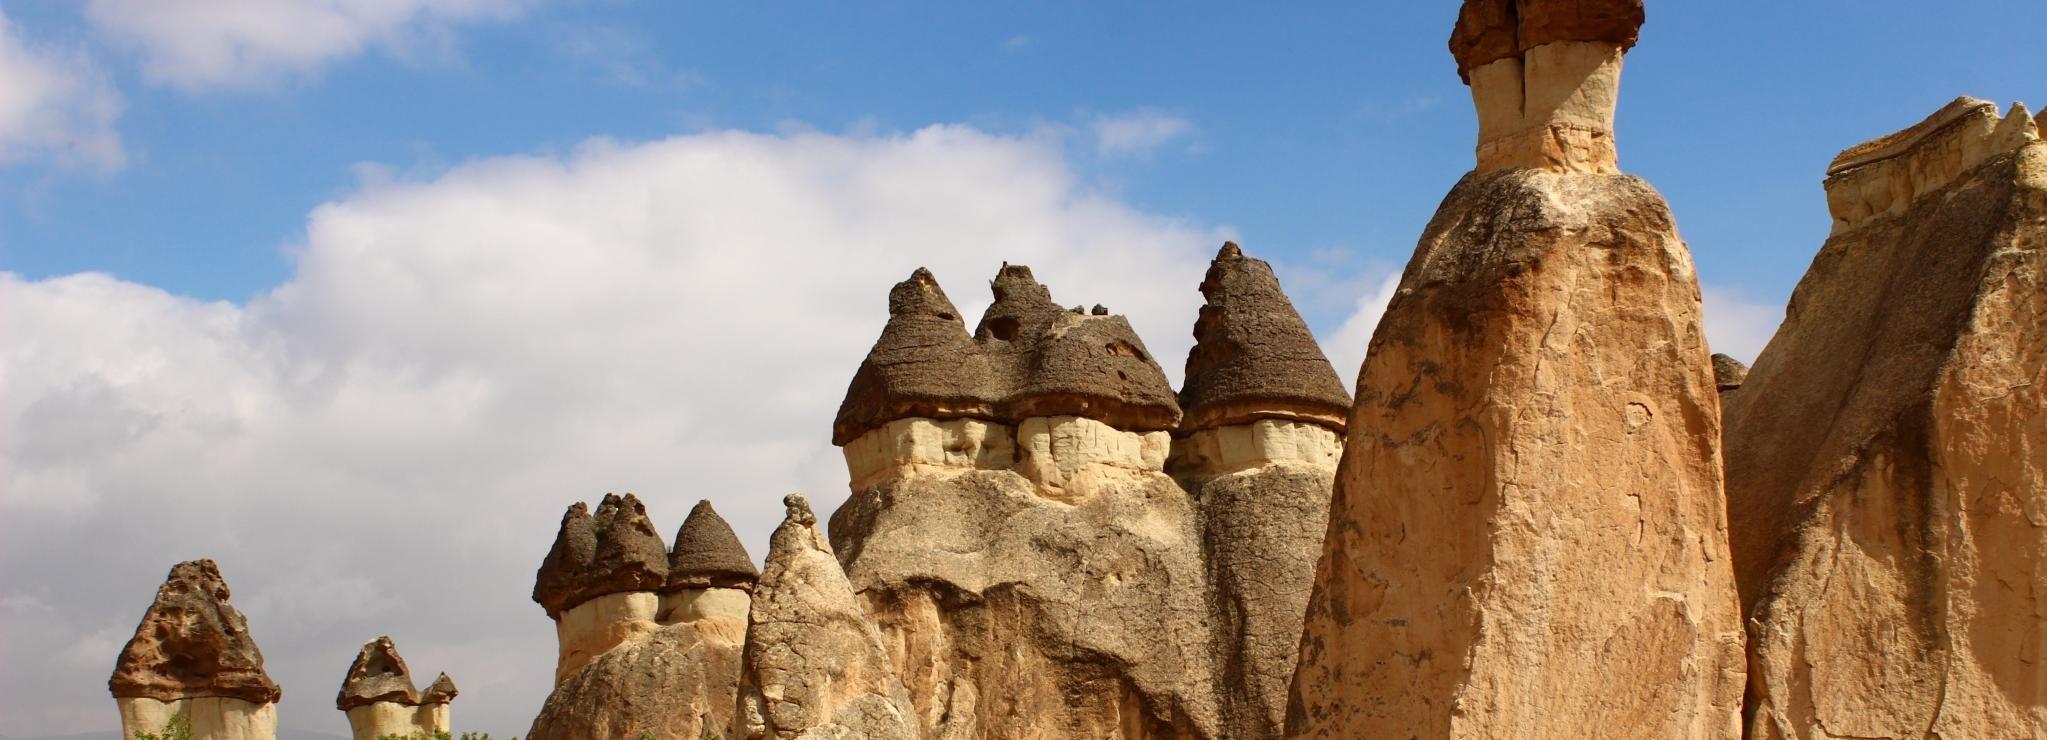 Göreme: Full-Day Cappadocia Private Tour